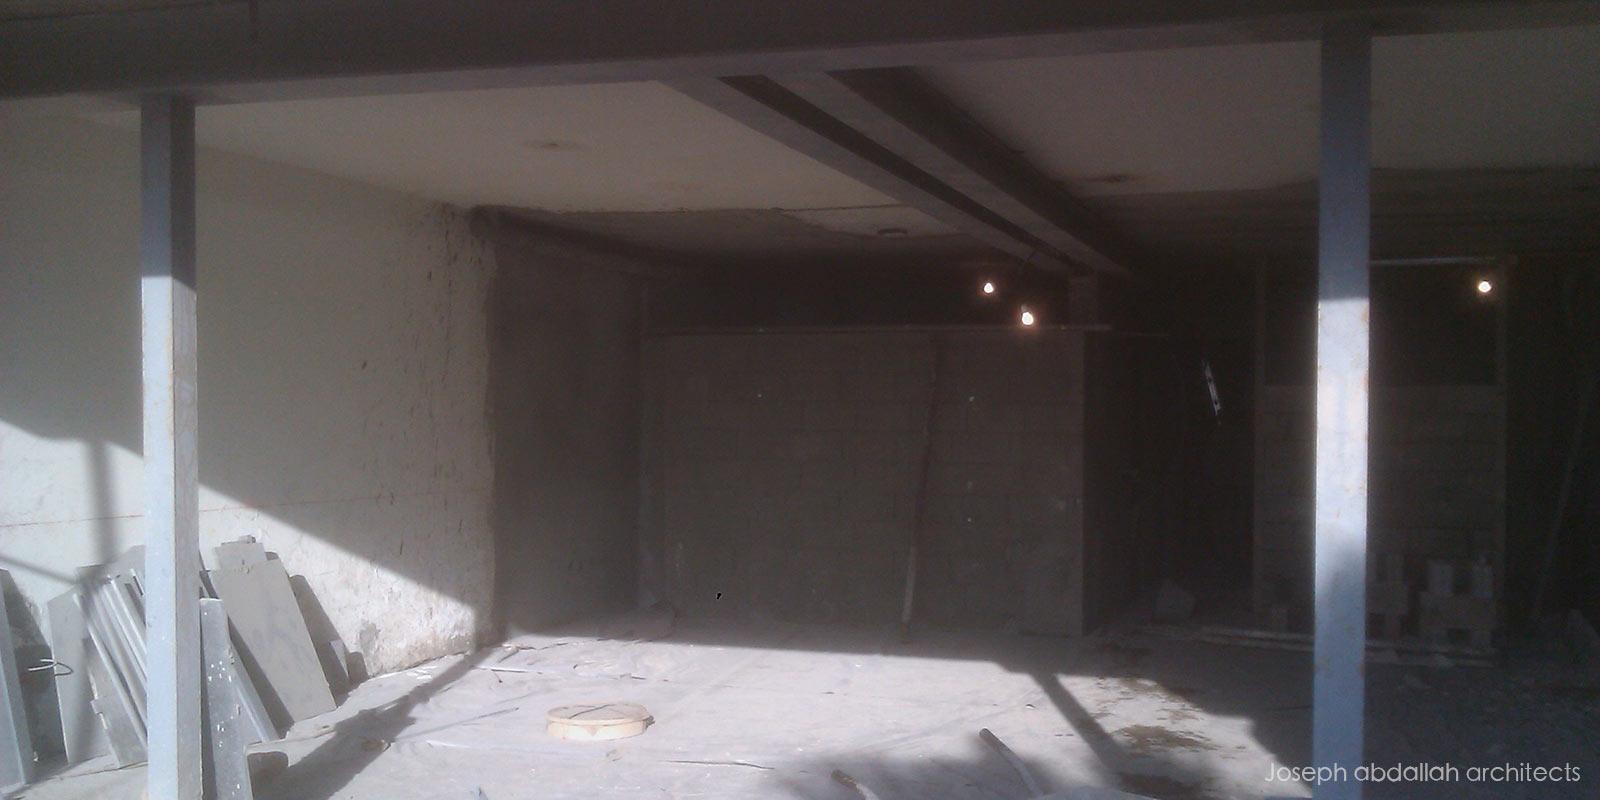 halat-sur-mer-hamod-chalet-interior-architecture-joseph-abdallah-architects-2